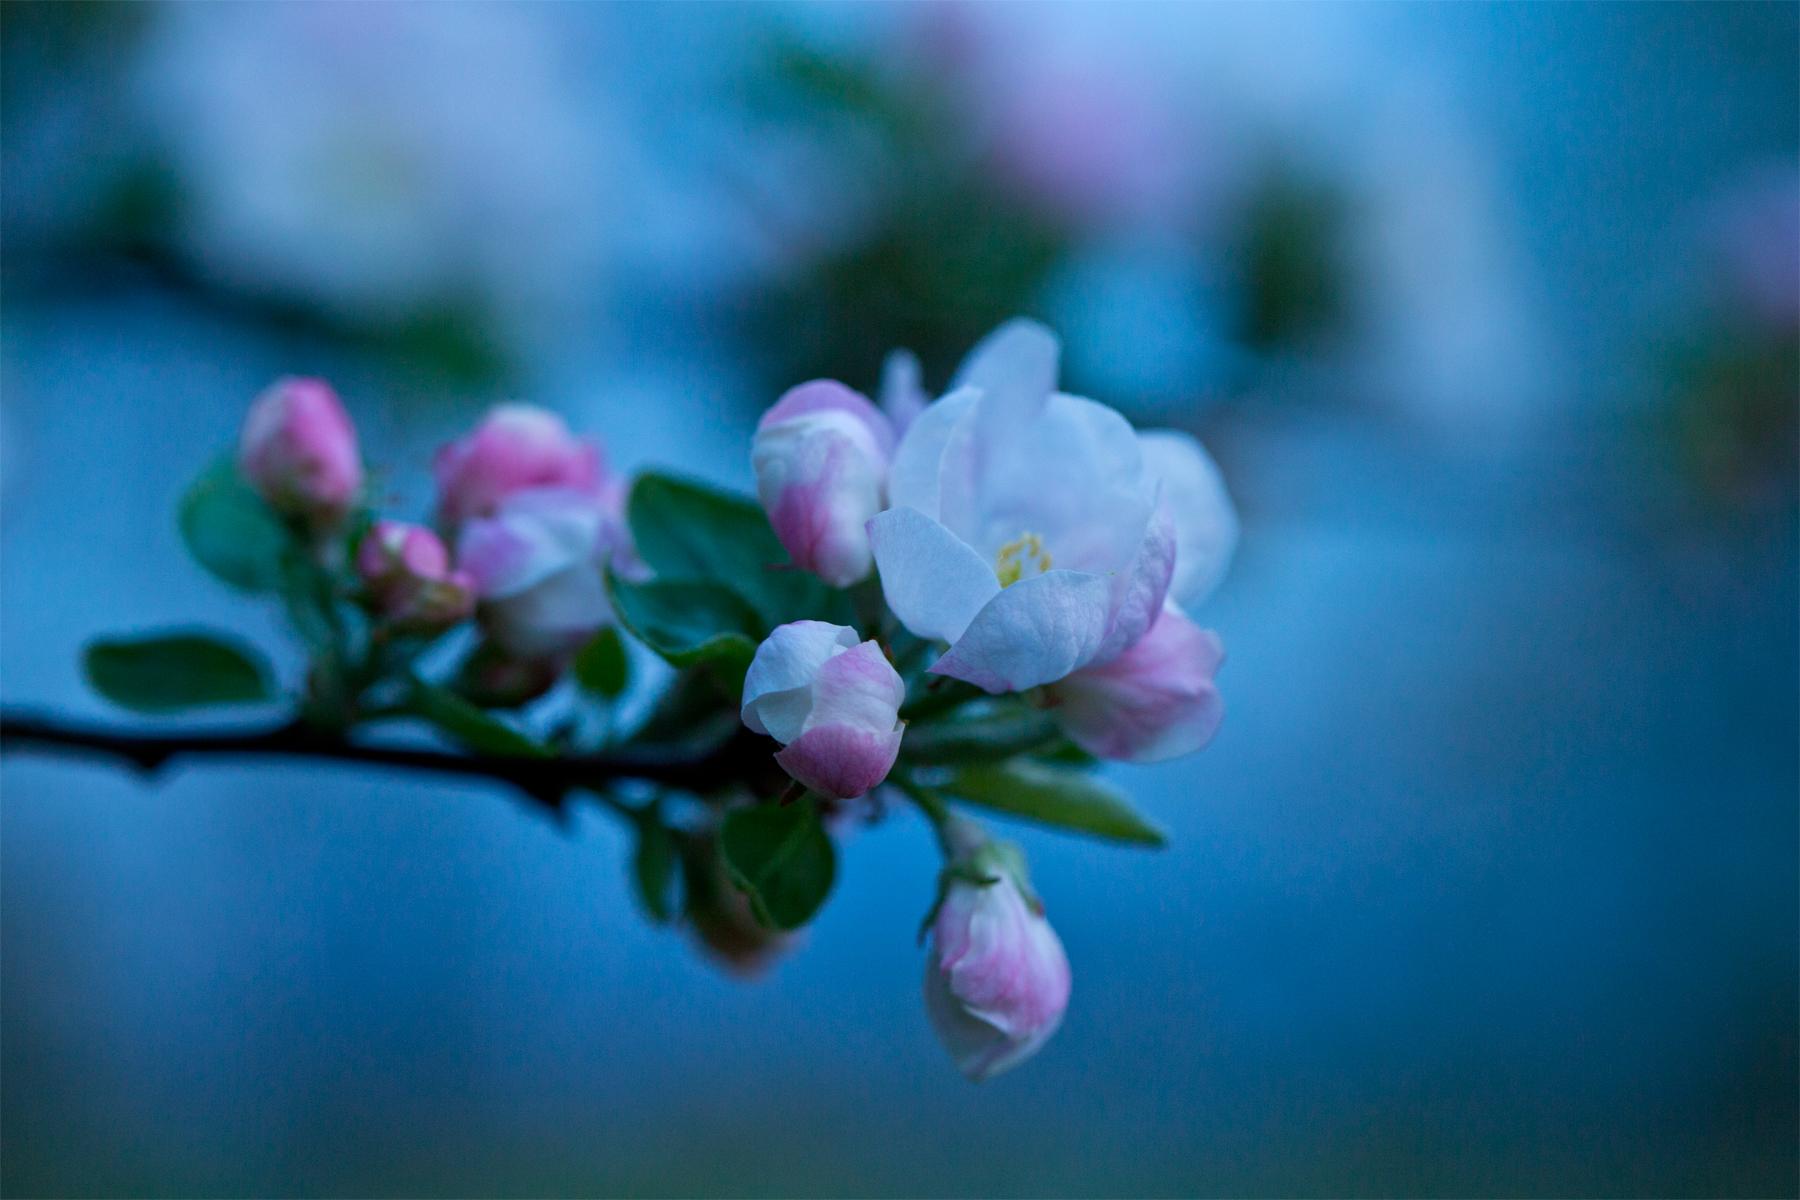 Halbgeöffnete Apfelblüte